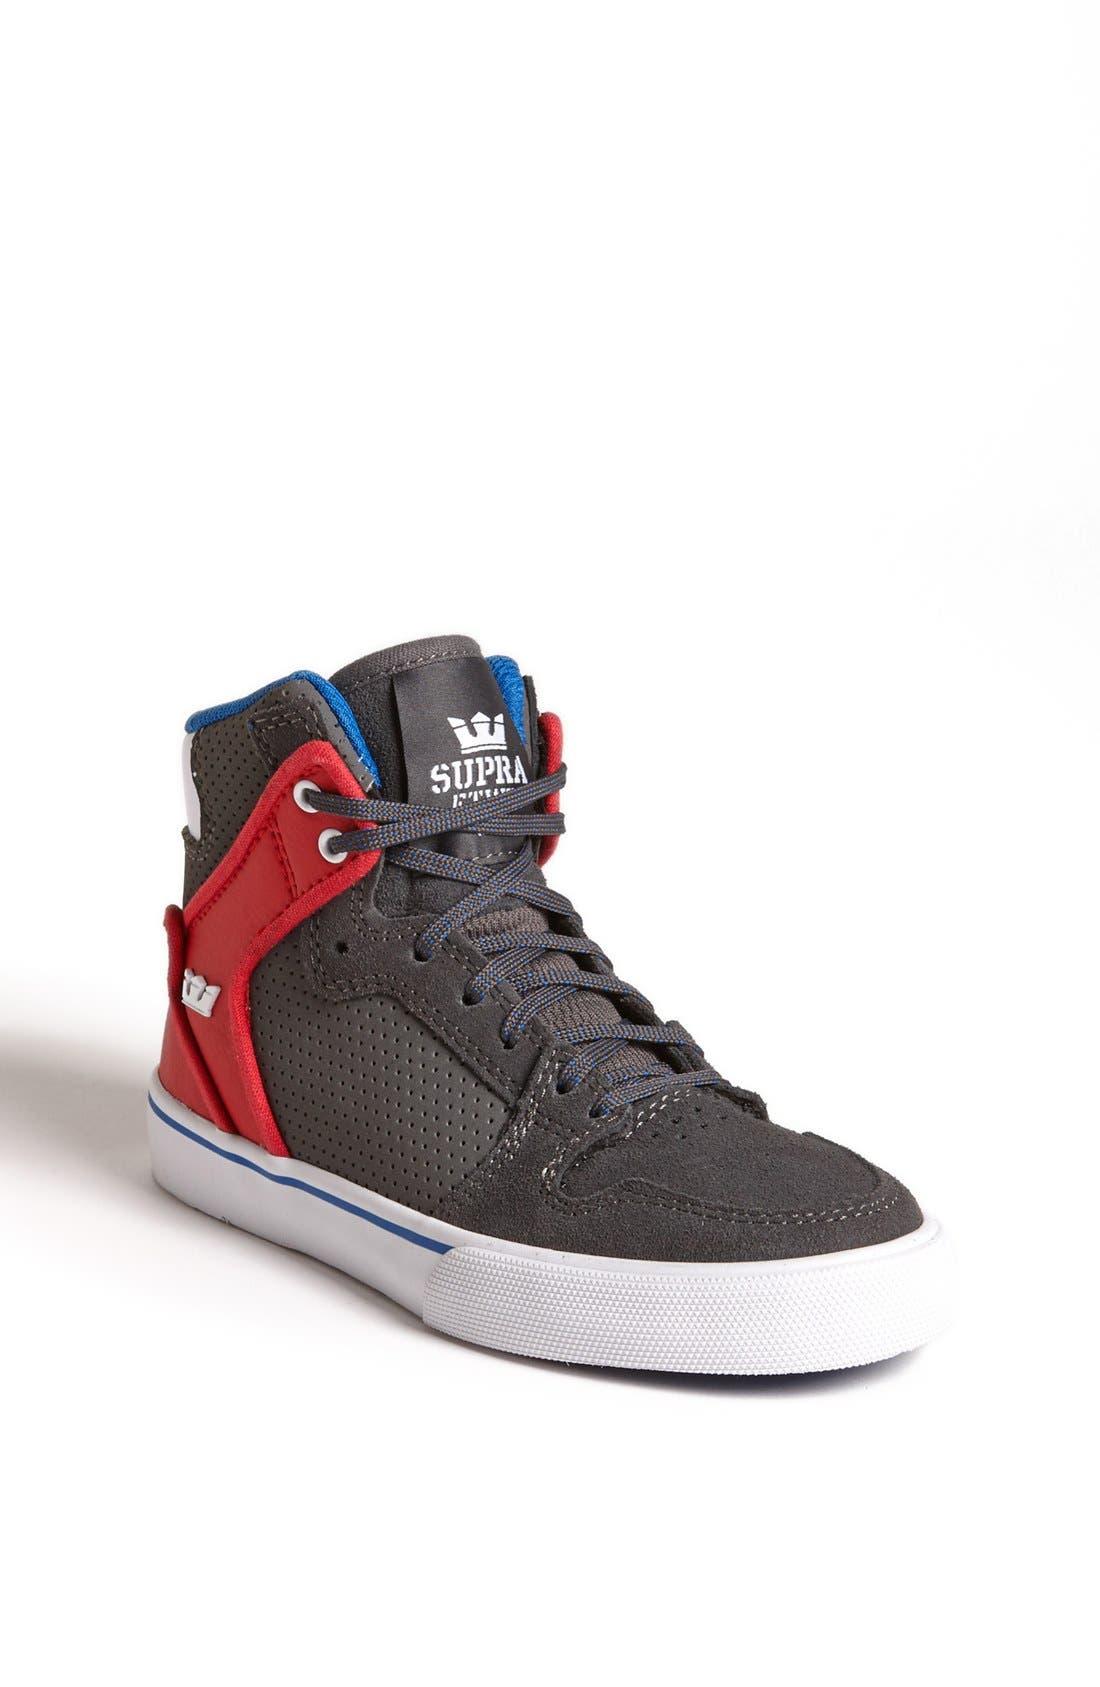 Main Image - Supra 'Vaider' Sneaker (Toddler, Little Kid & Big Kid)